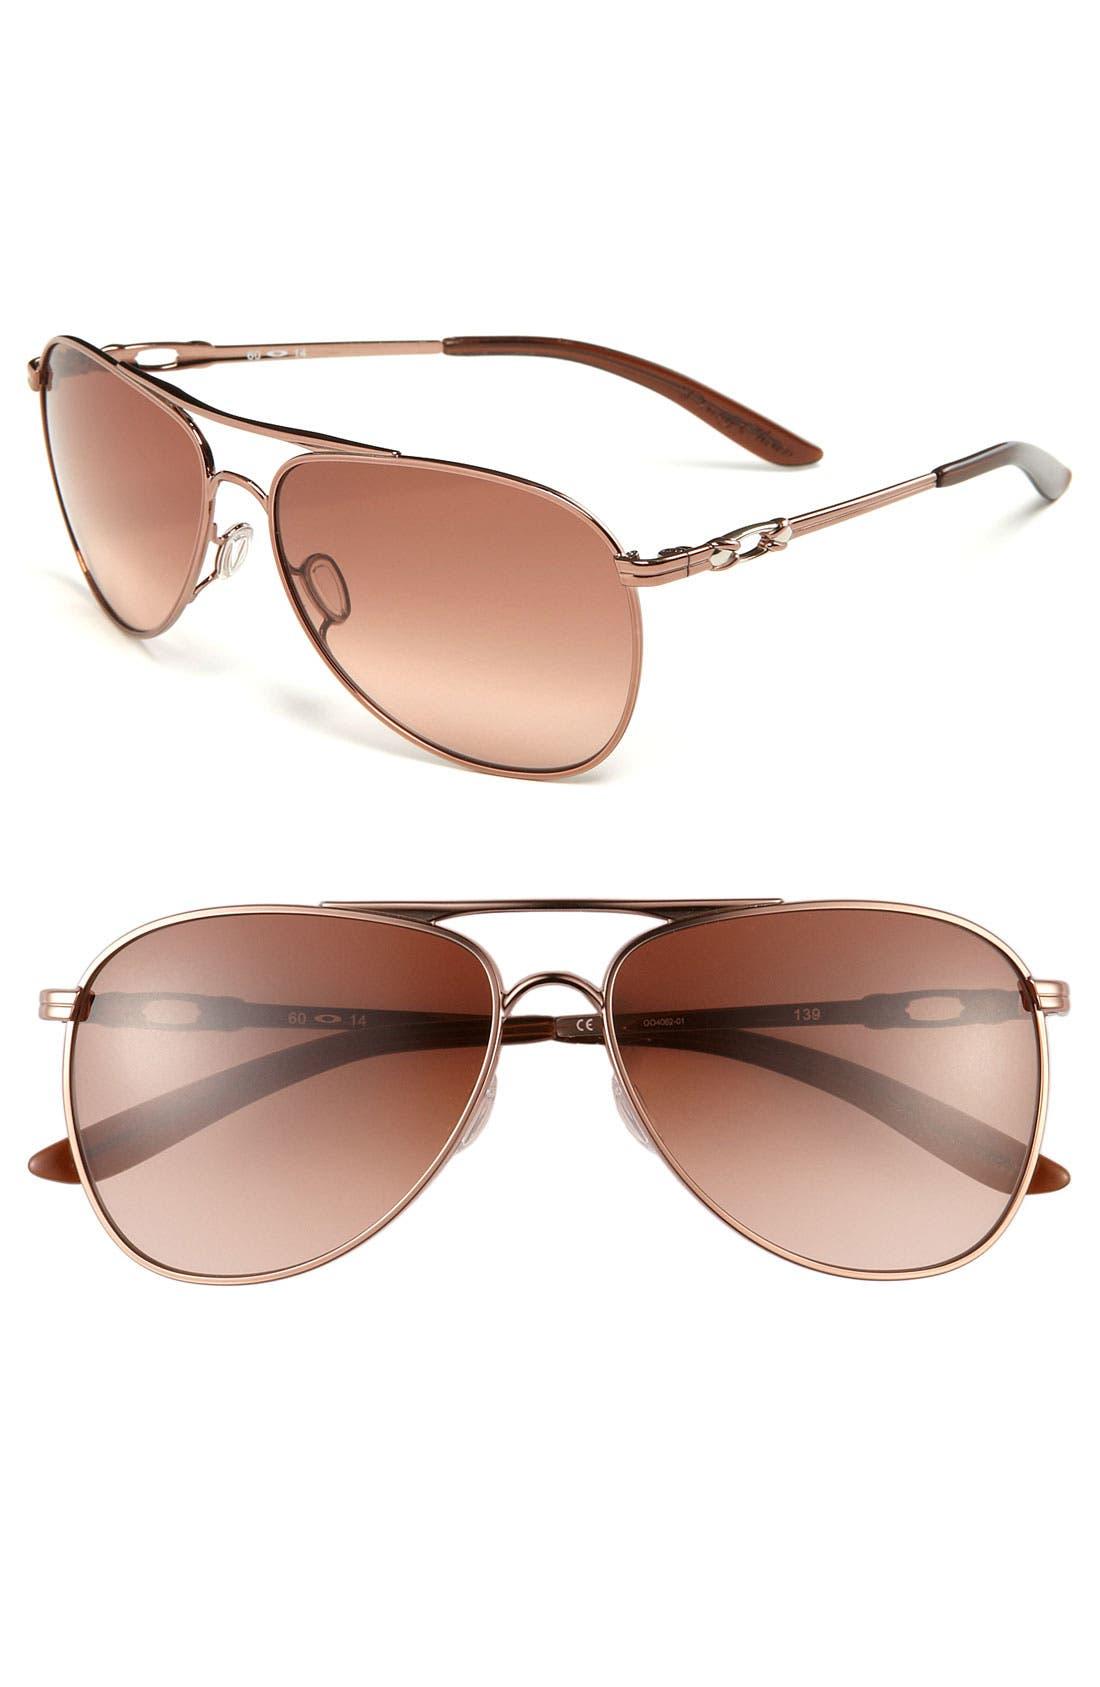 Alternate Image 1 Selected - Oakley 60mm Gradient Lens Aviator Sunglasses